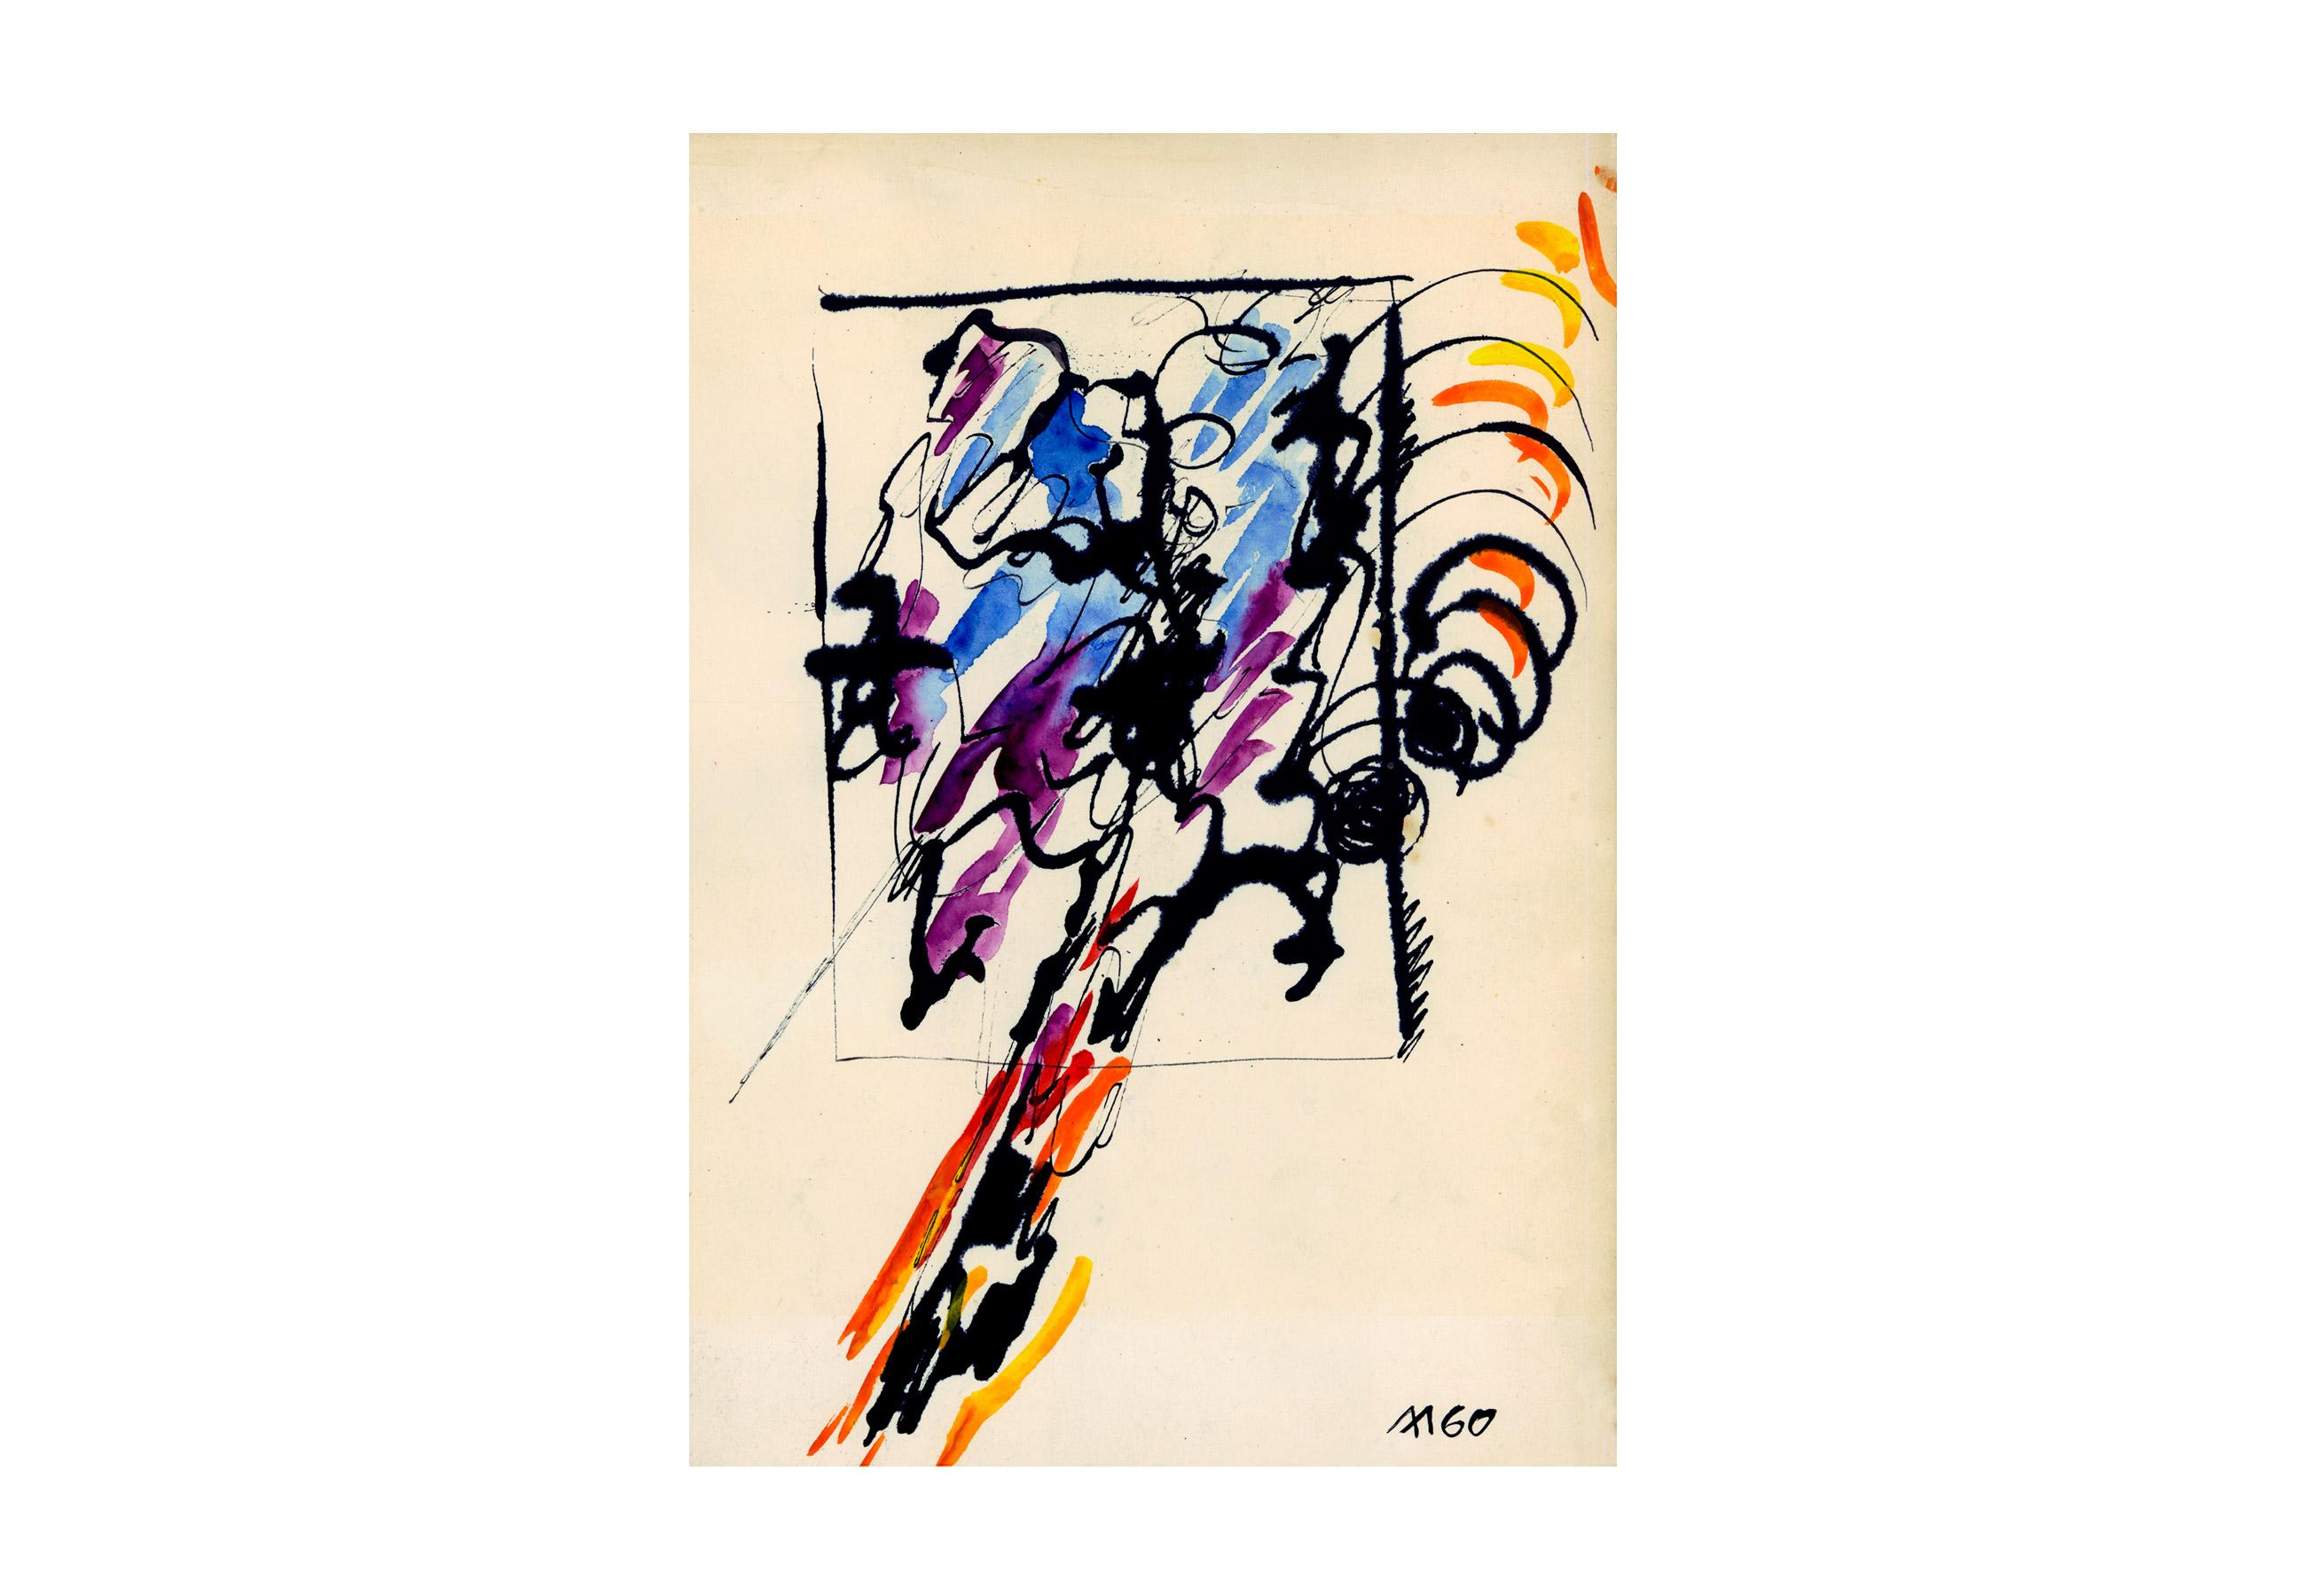 Lamm-Portfolio-1960-69-03.jpg